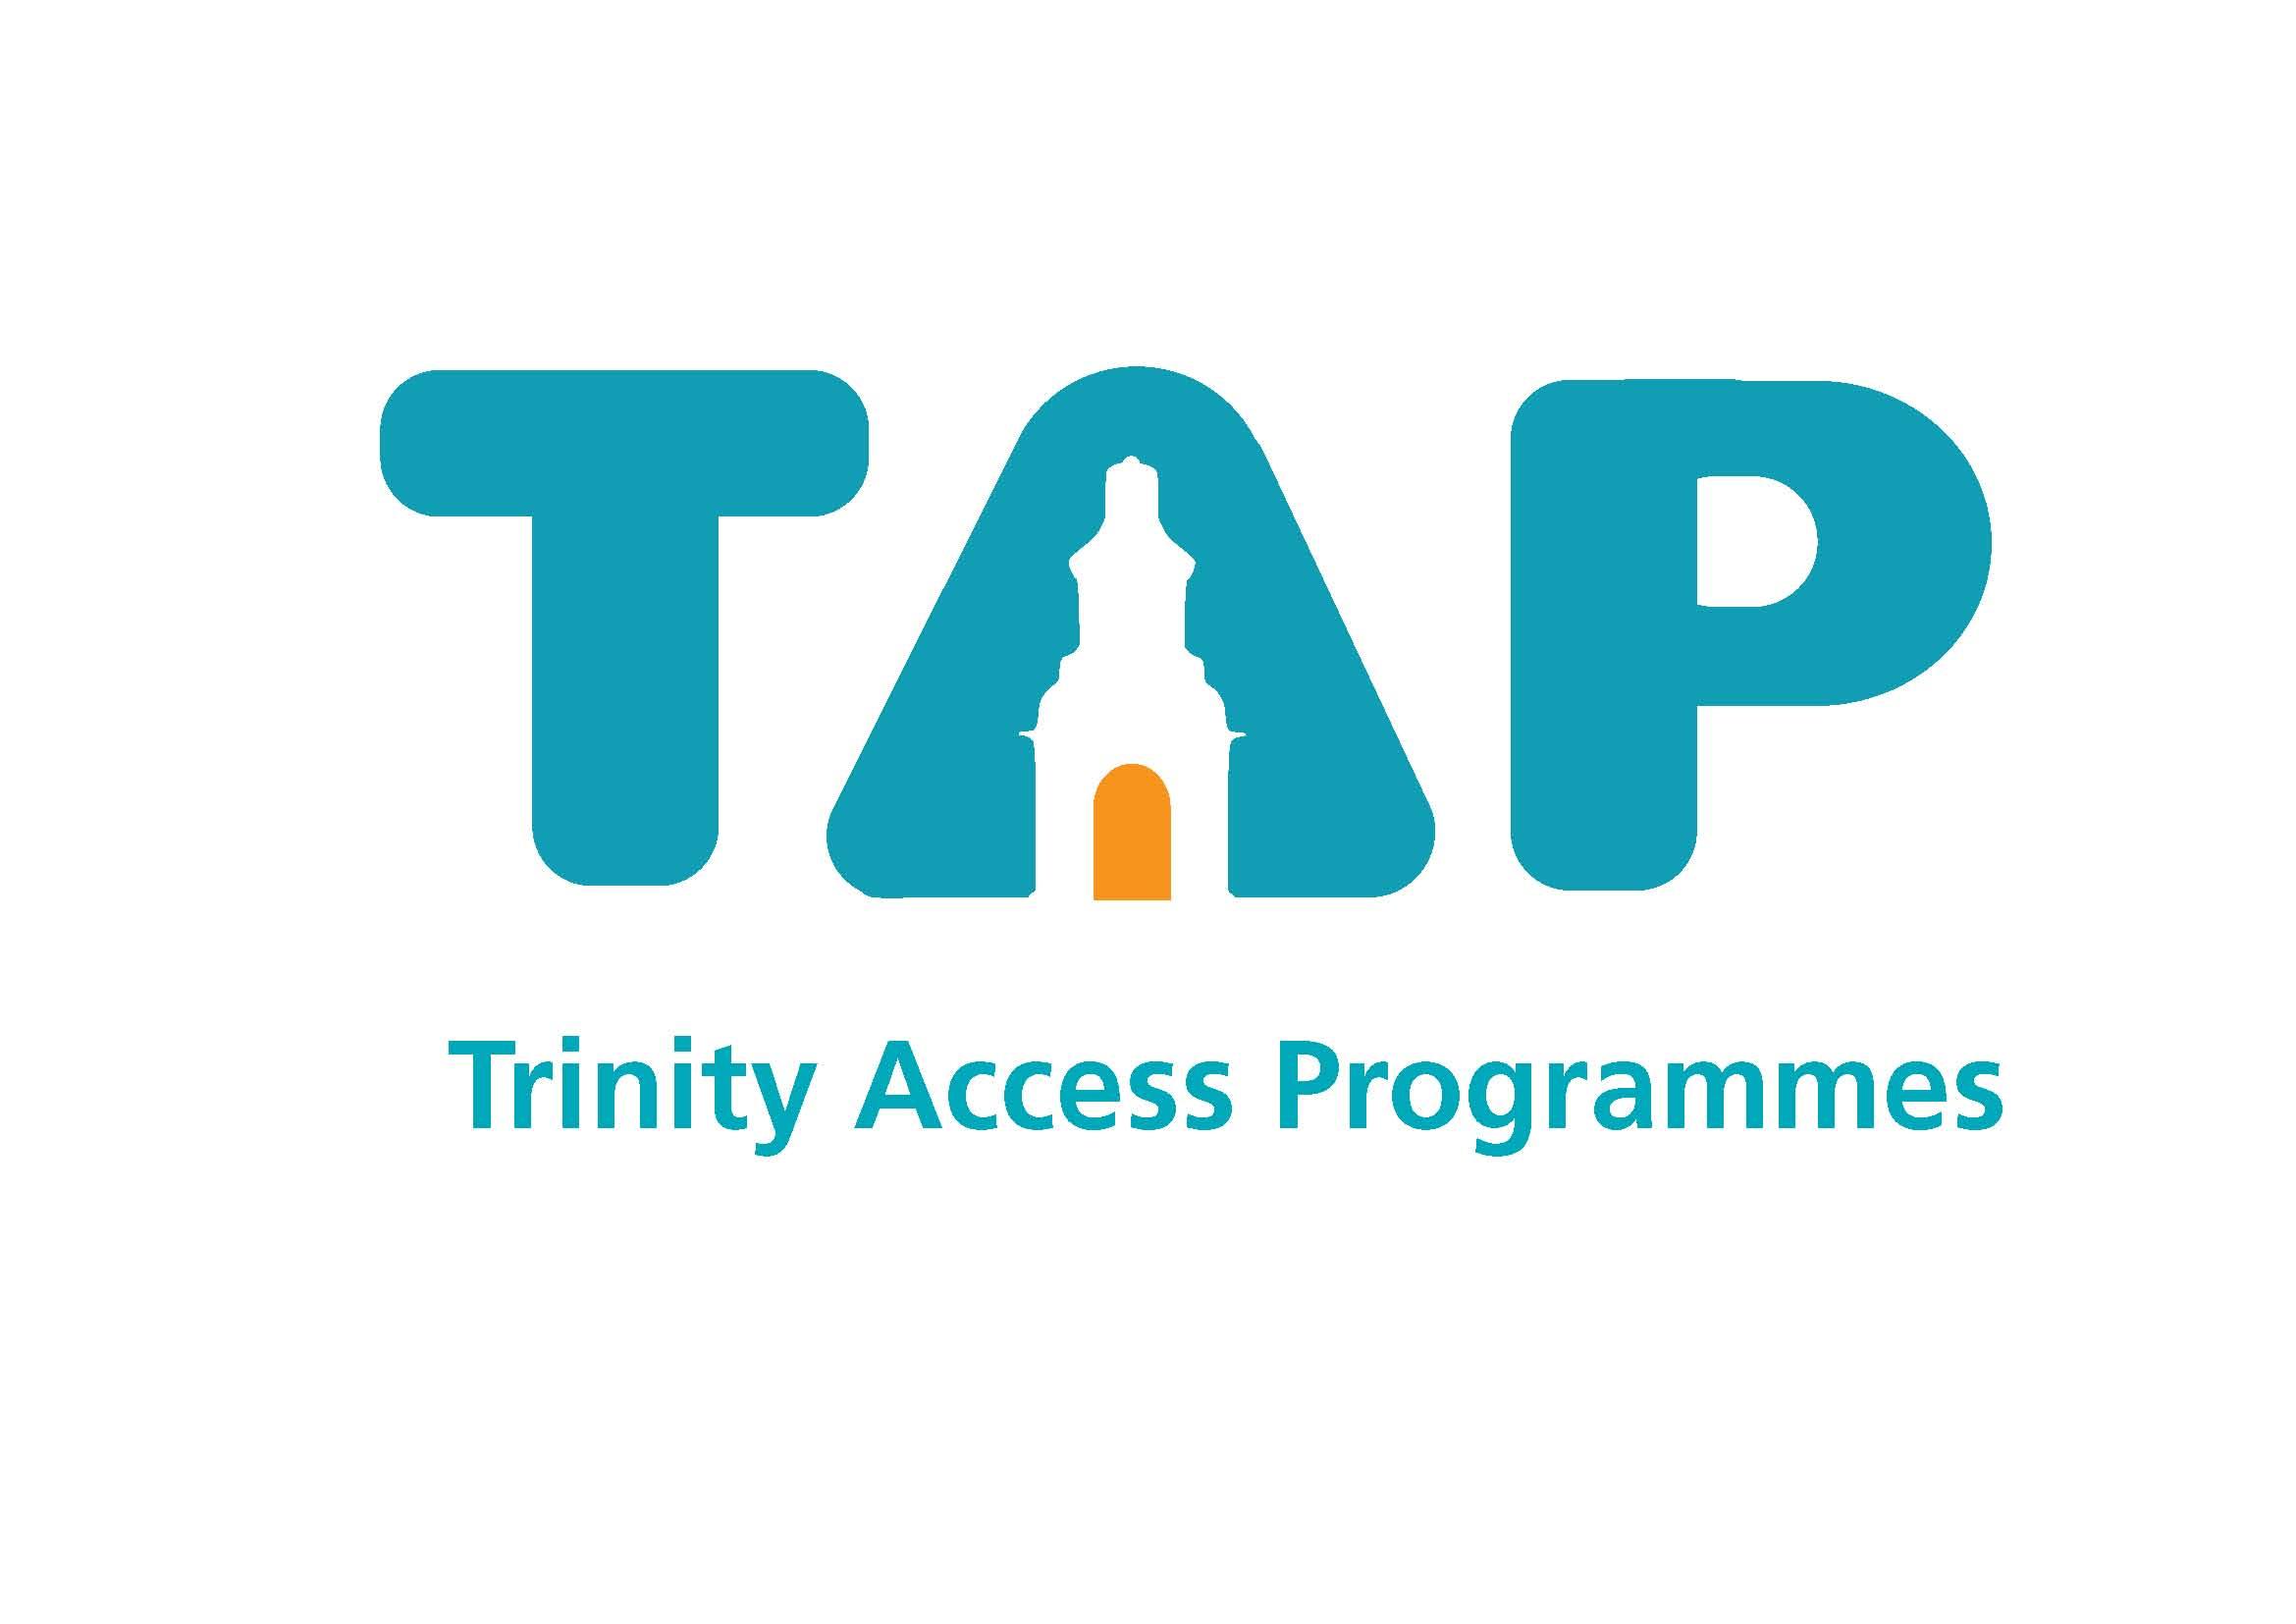 Trinity Access Programme